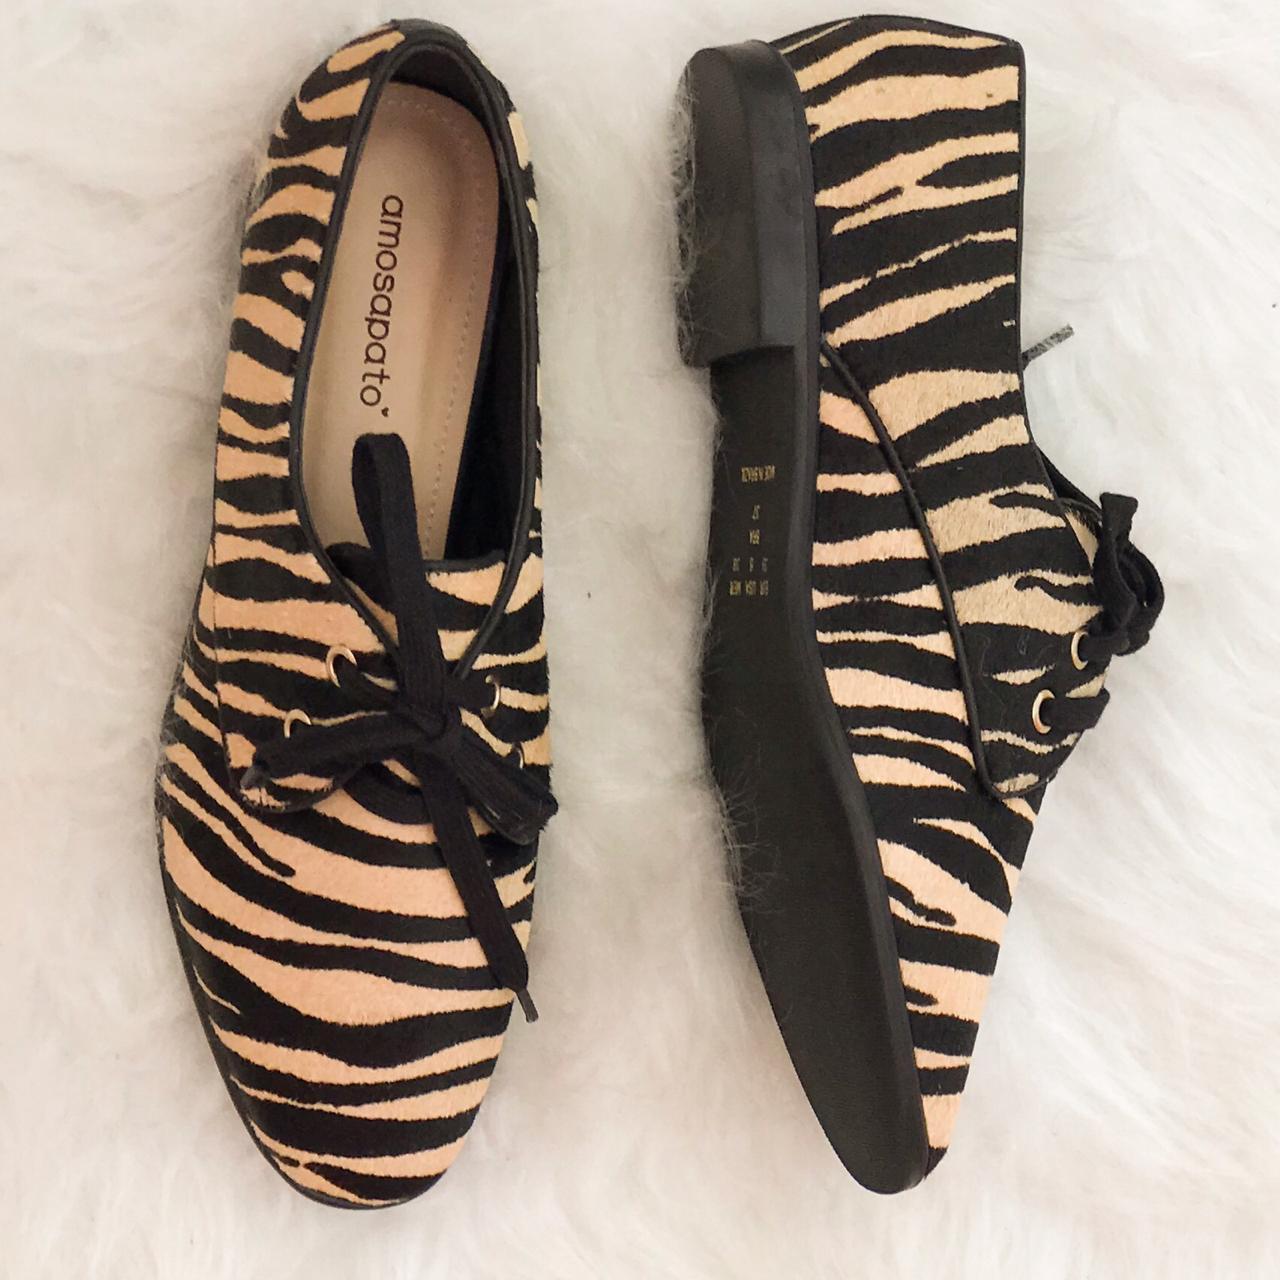 Oxford Zebra Bege